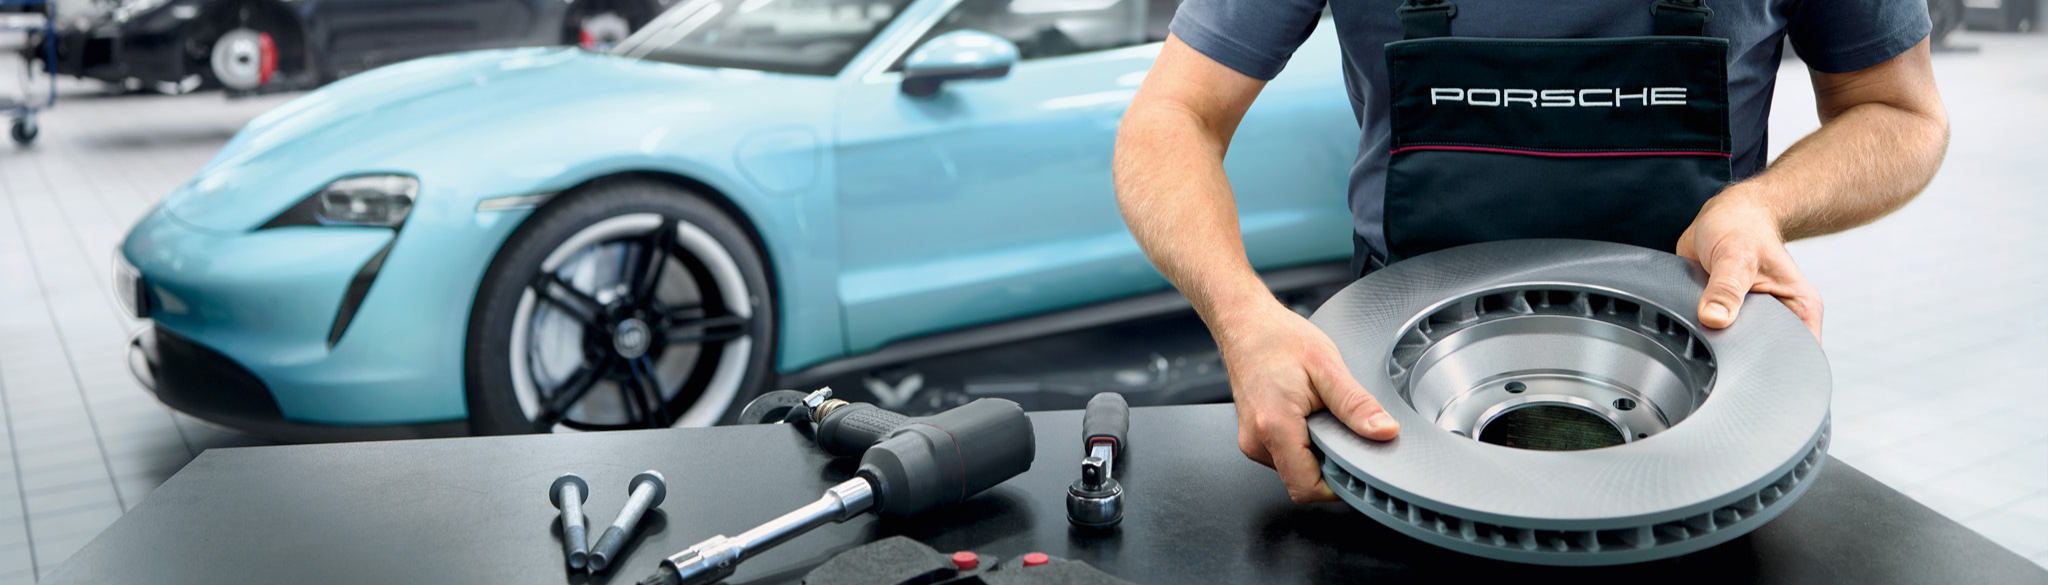 Porsche Taycan Maintenance